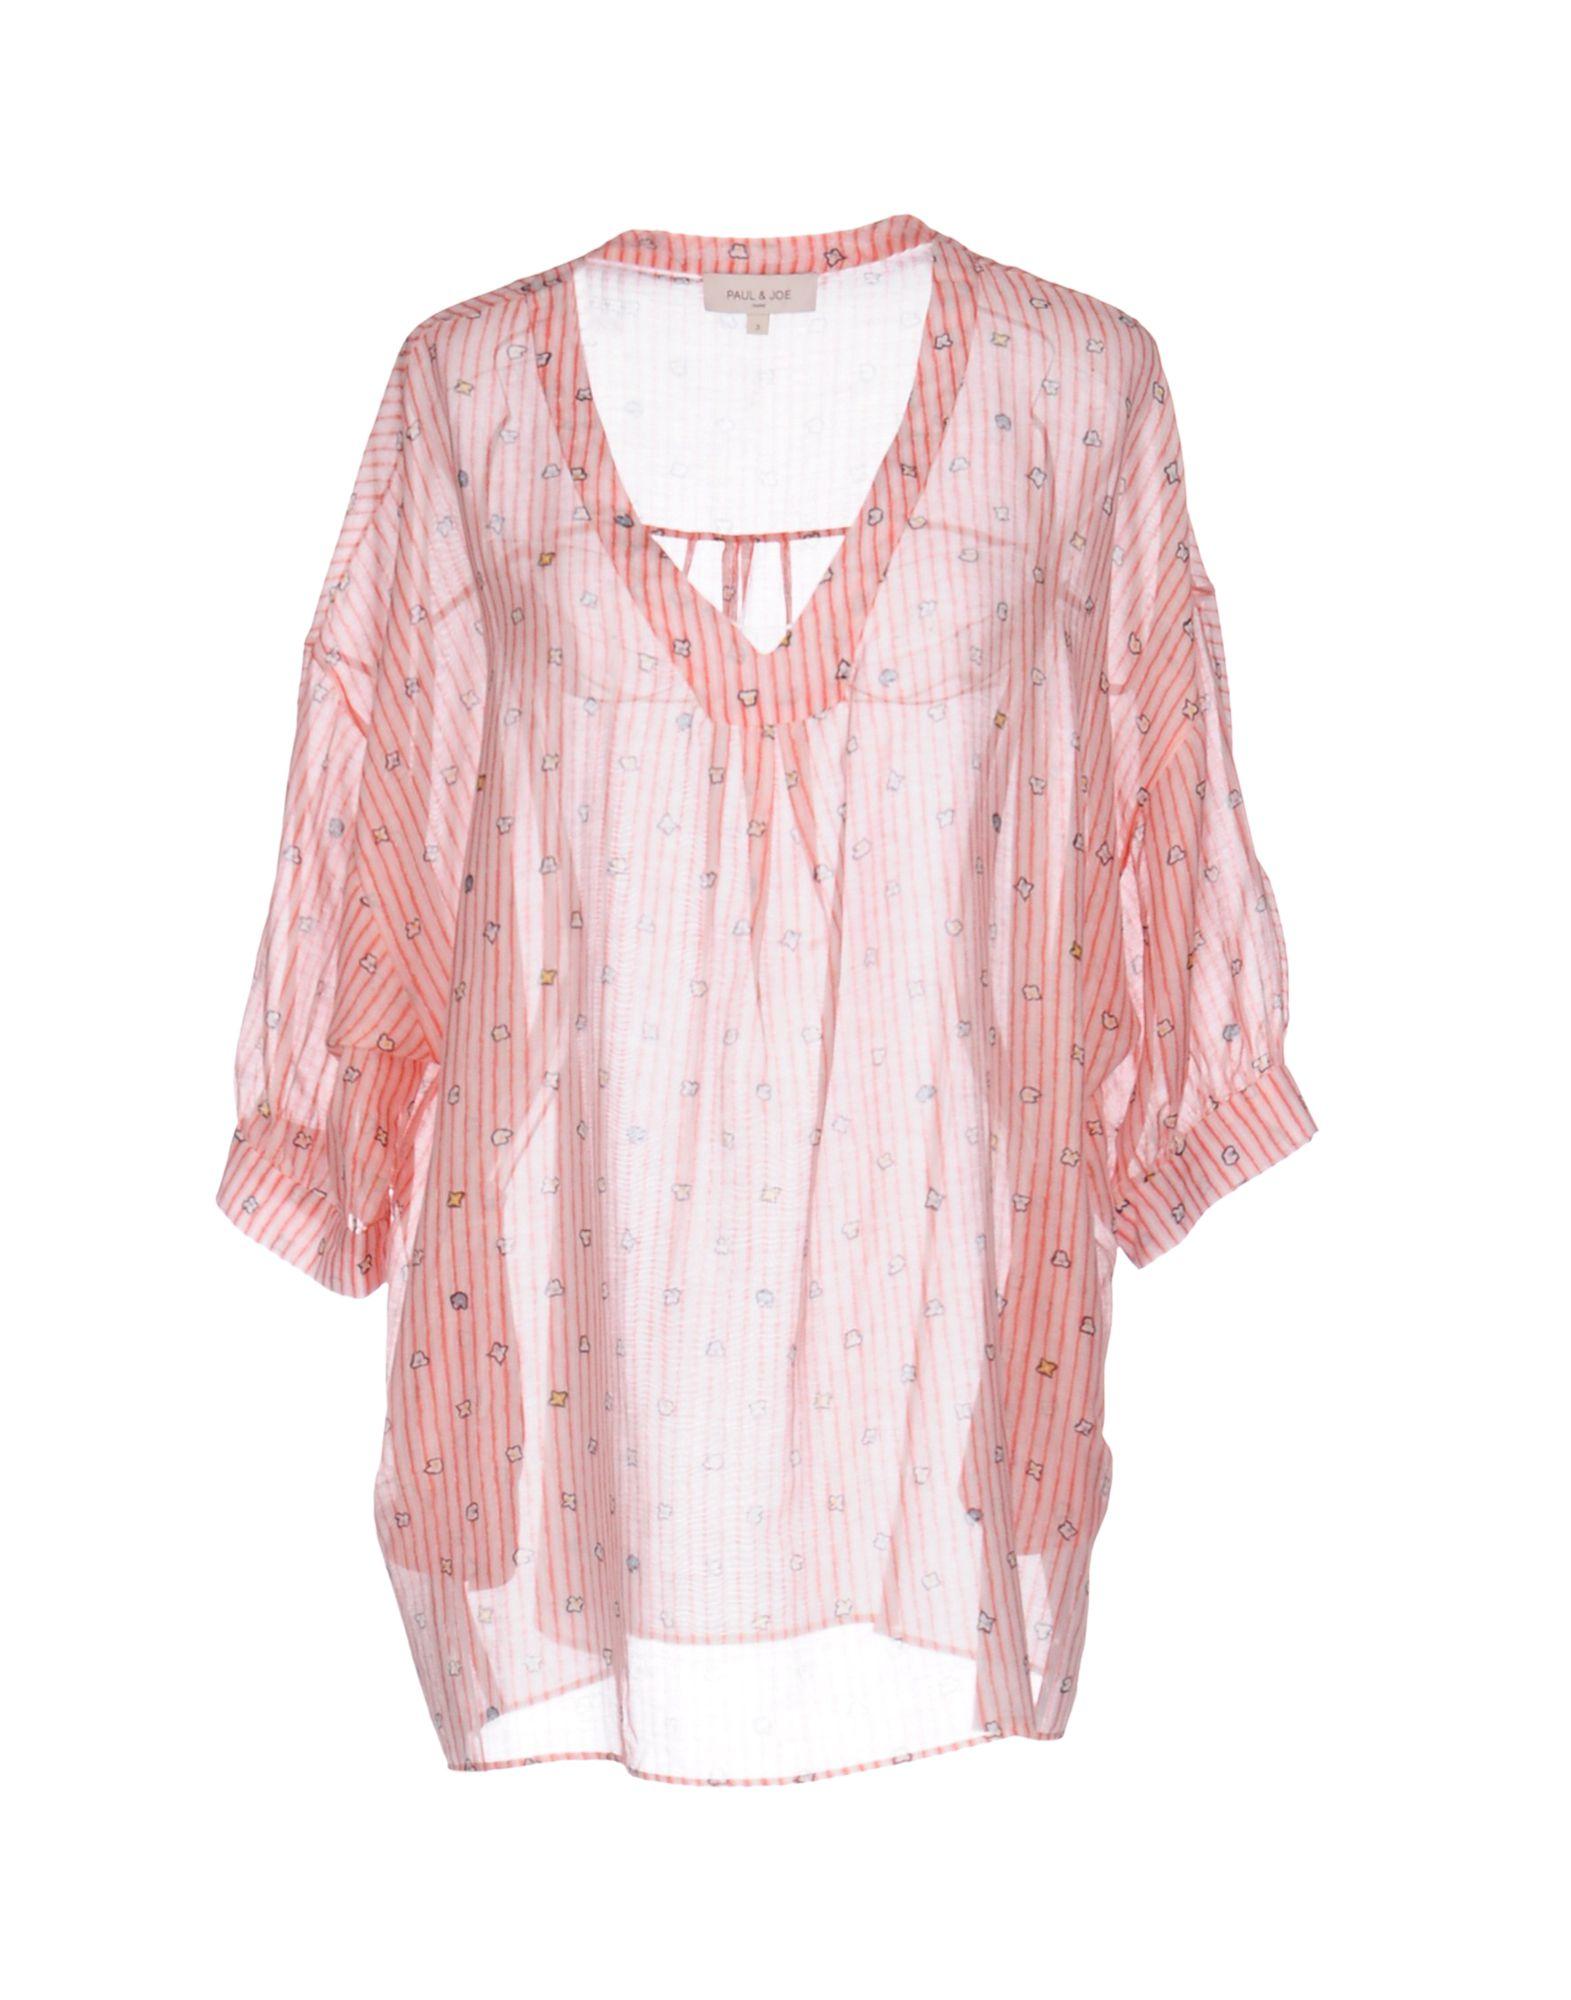 PAUL & JOE Damen Bluse Farbe Koralle Größe 5 jetztbilligerkaufen